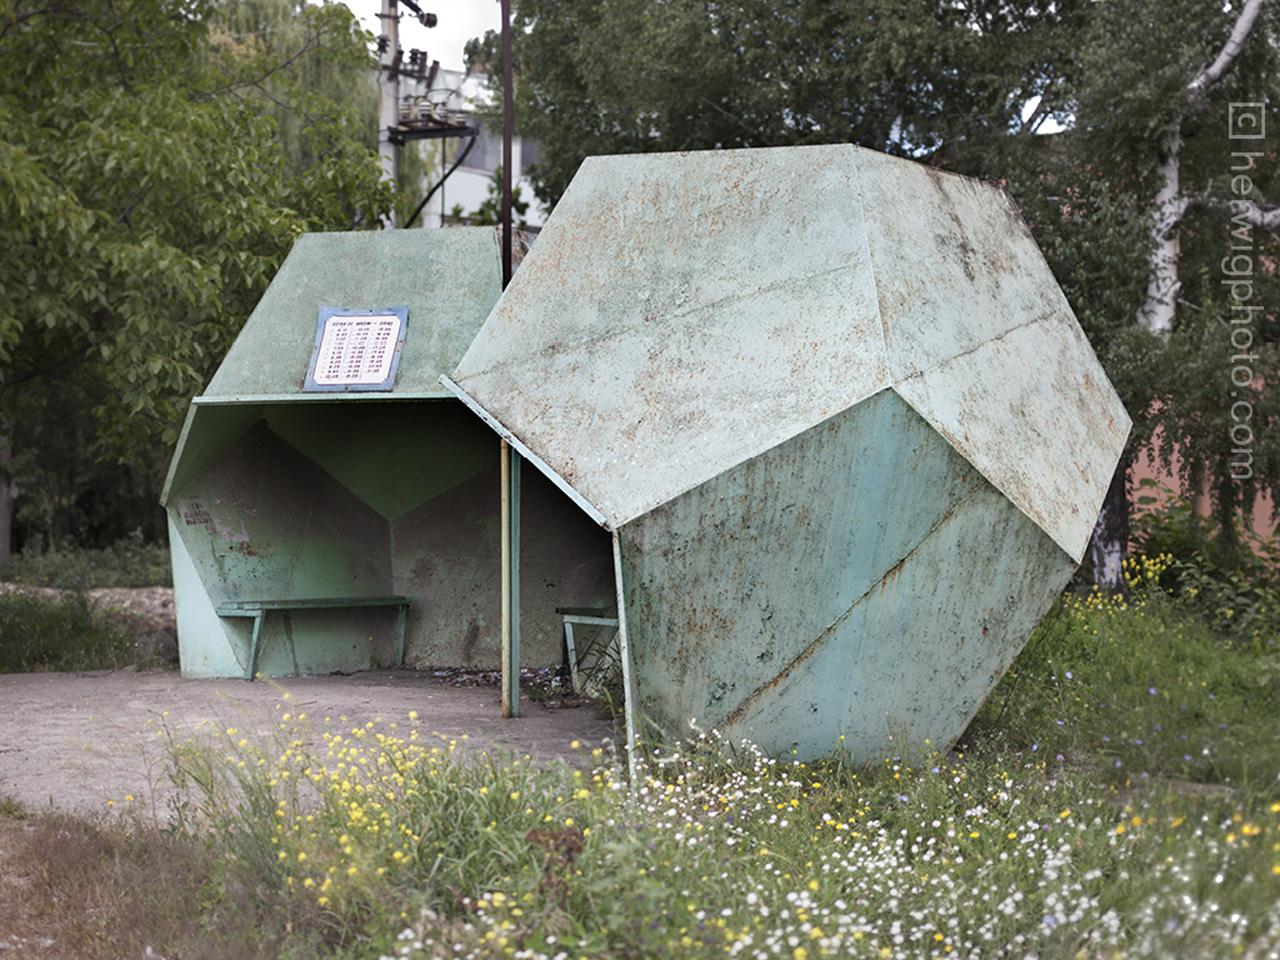 531daa9ac07a802c270002e6_a-collection-of-striking-soviet-bus-stop-designs_falestimoldova